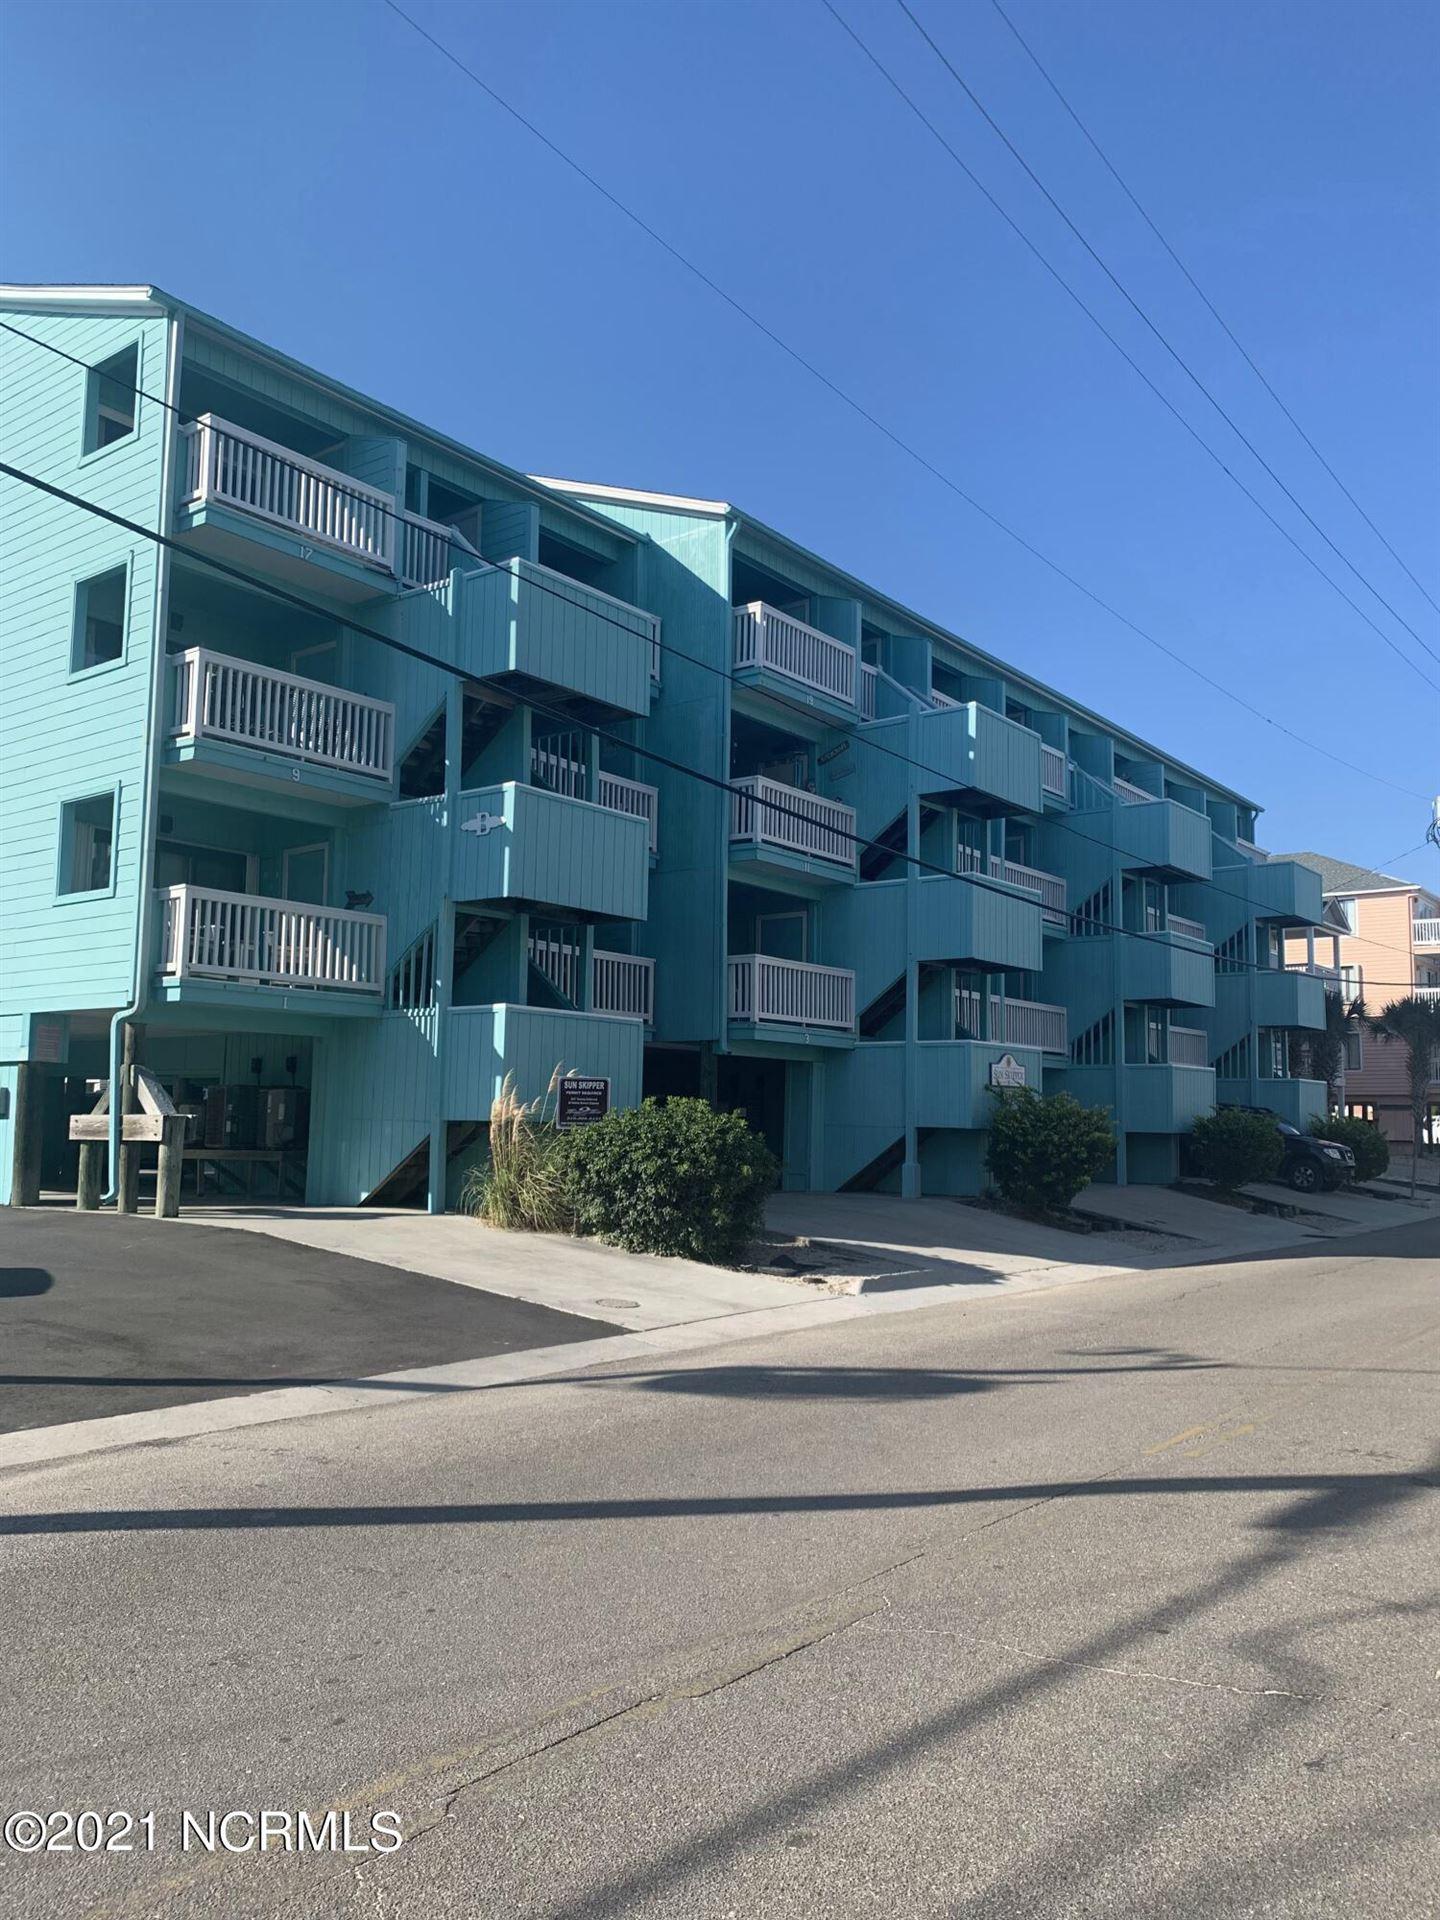 Photo of 1601 Carolina Beach Avenue N #B5, Carolina Beach, NC 28428 (MLS # 100292557)